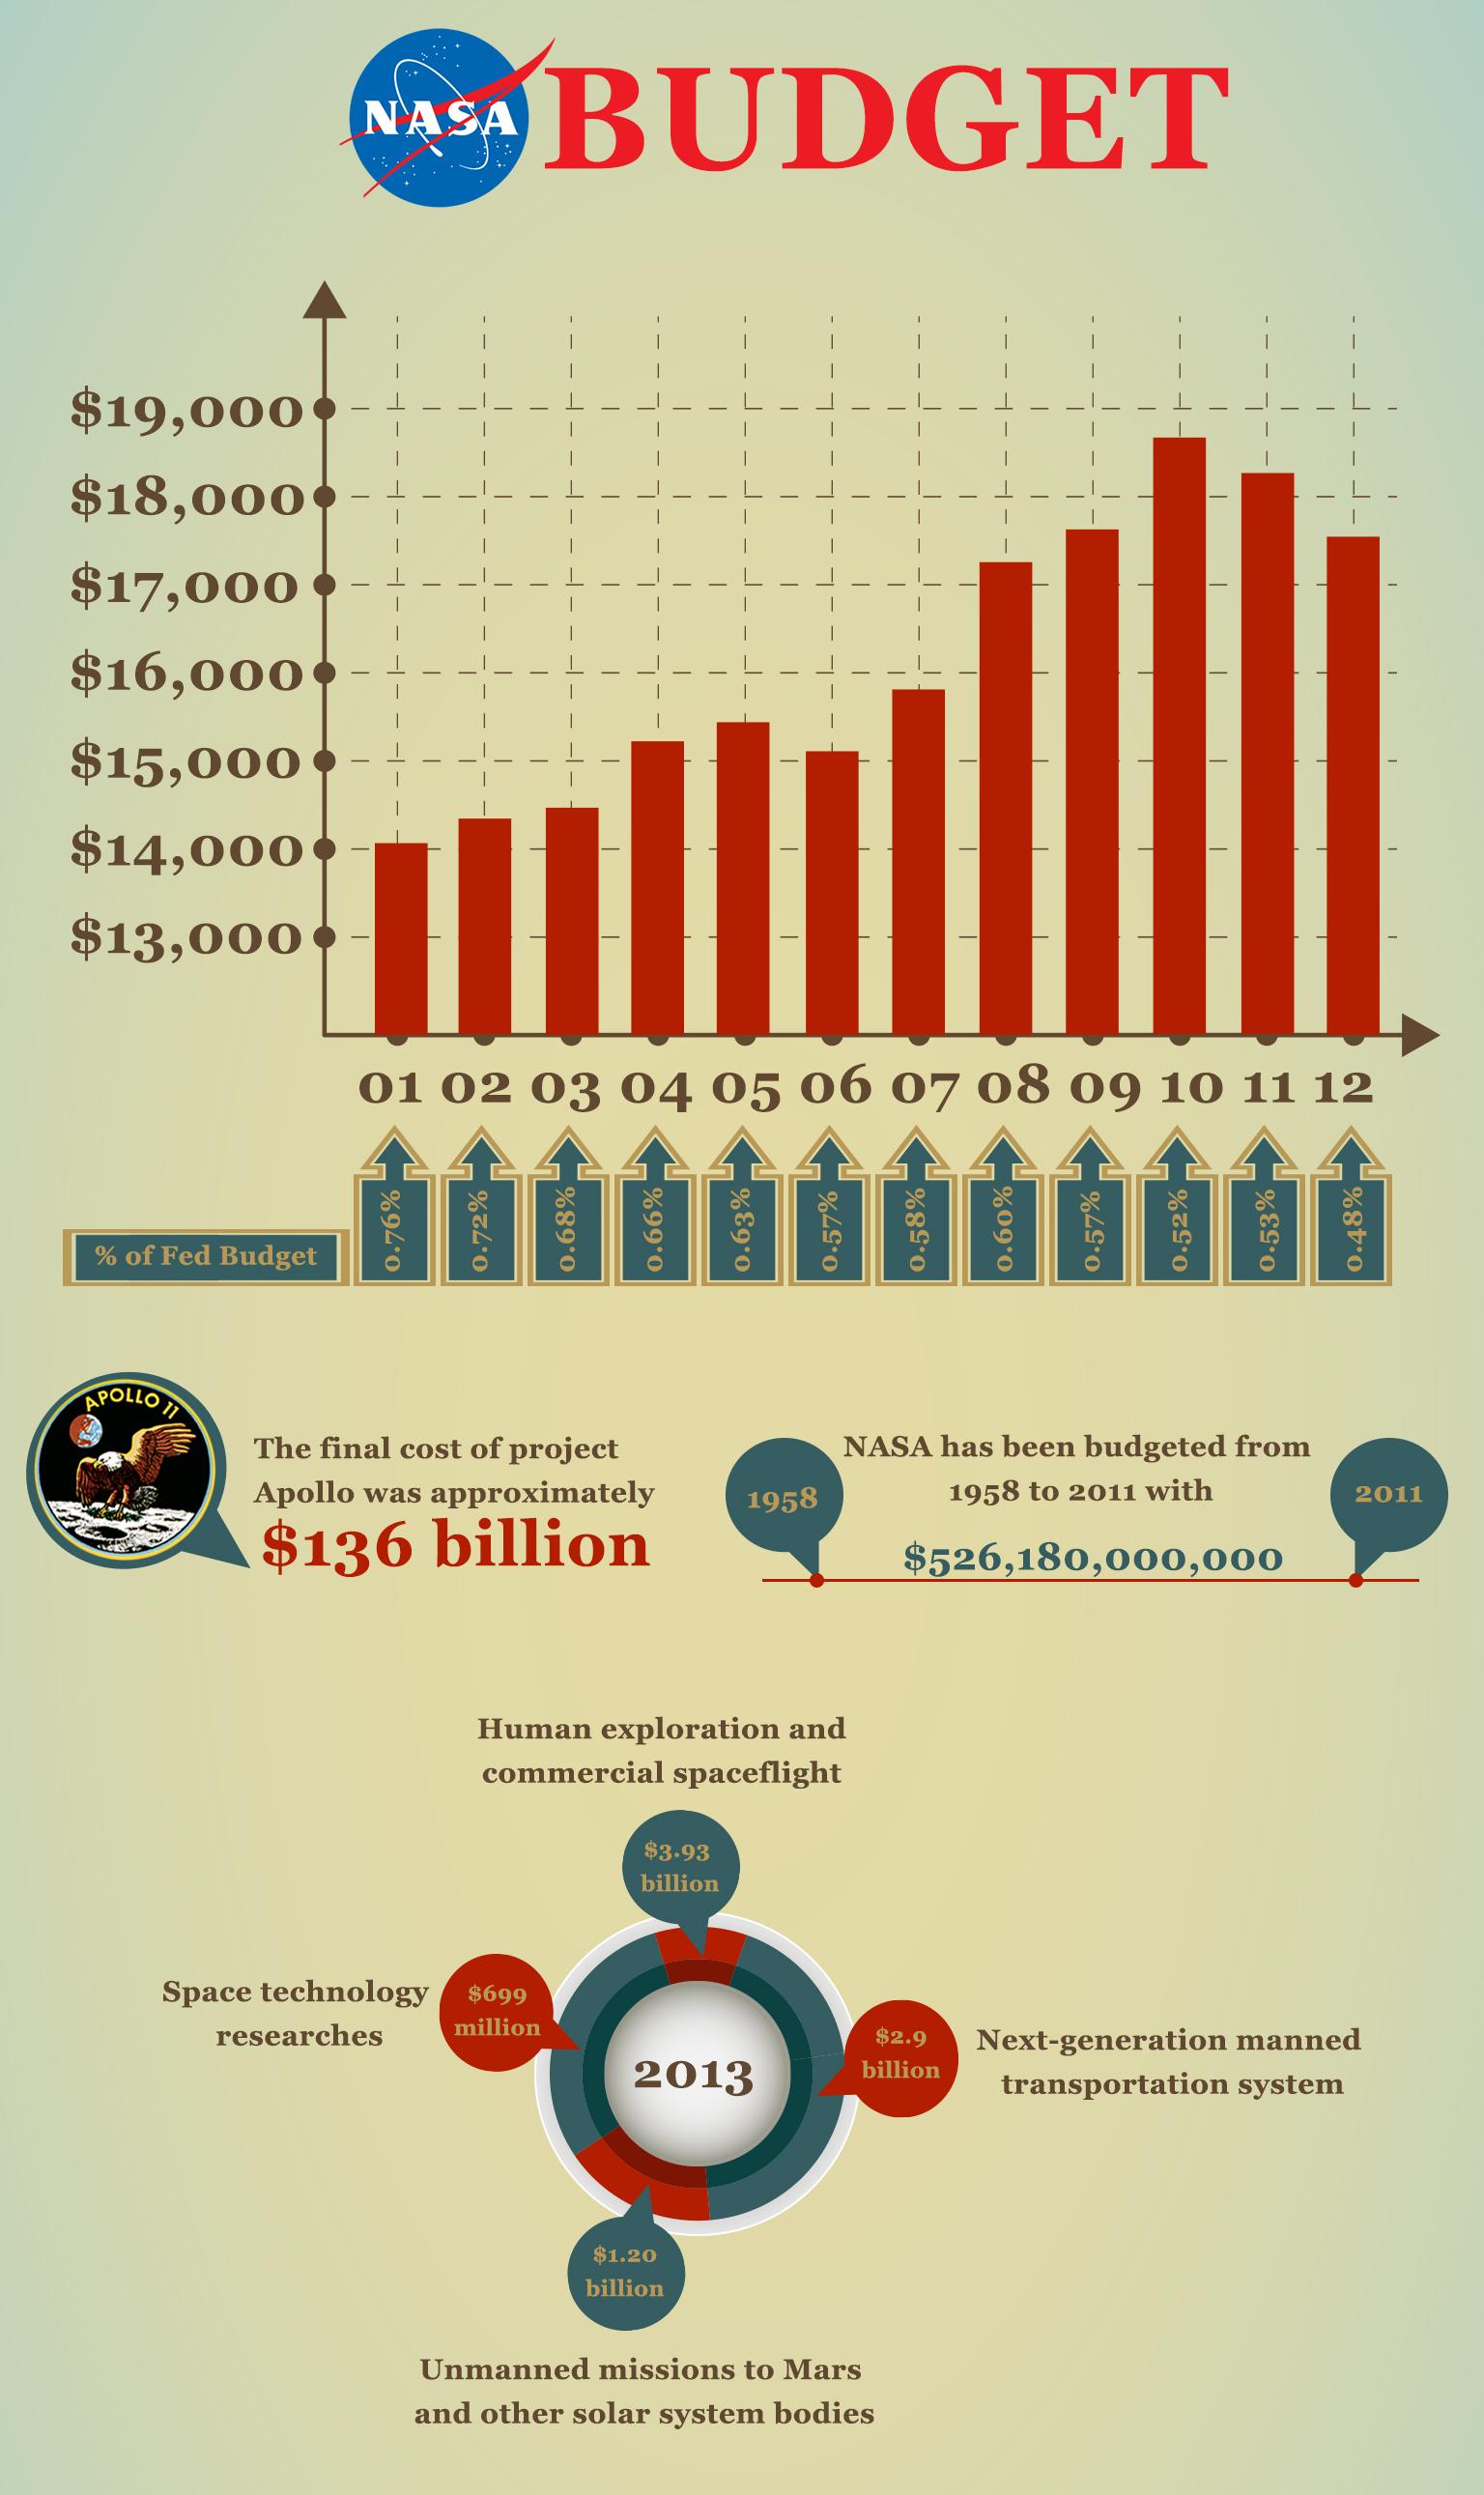 NASA Budget Over The Years: Infographic | CashSherpa.com ...